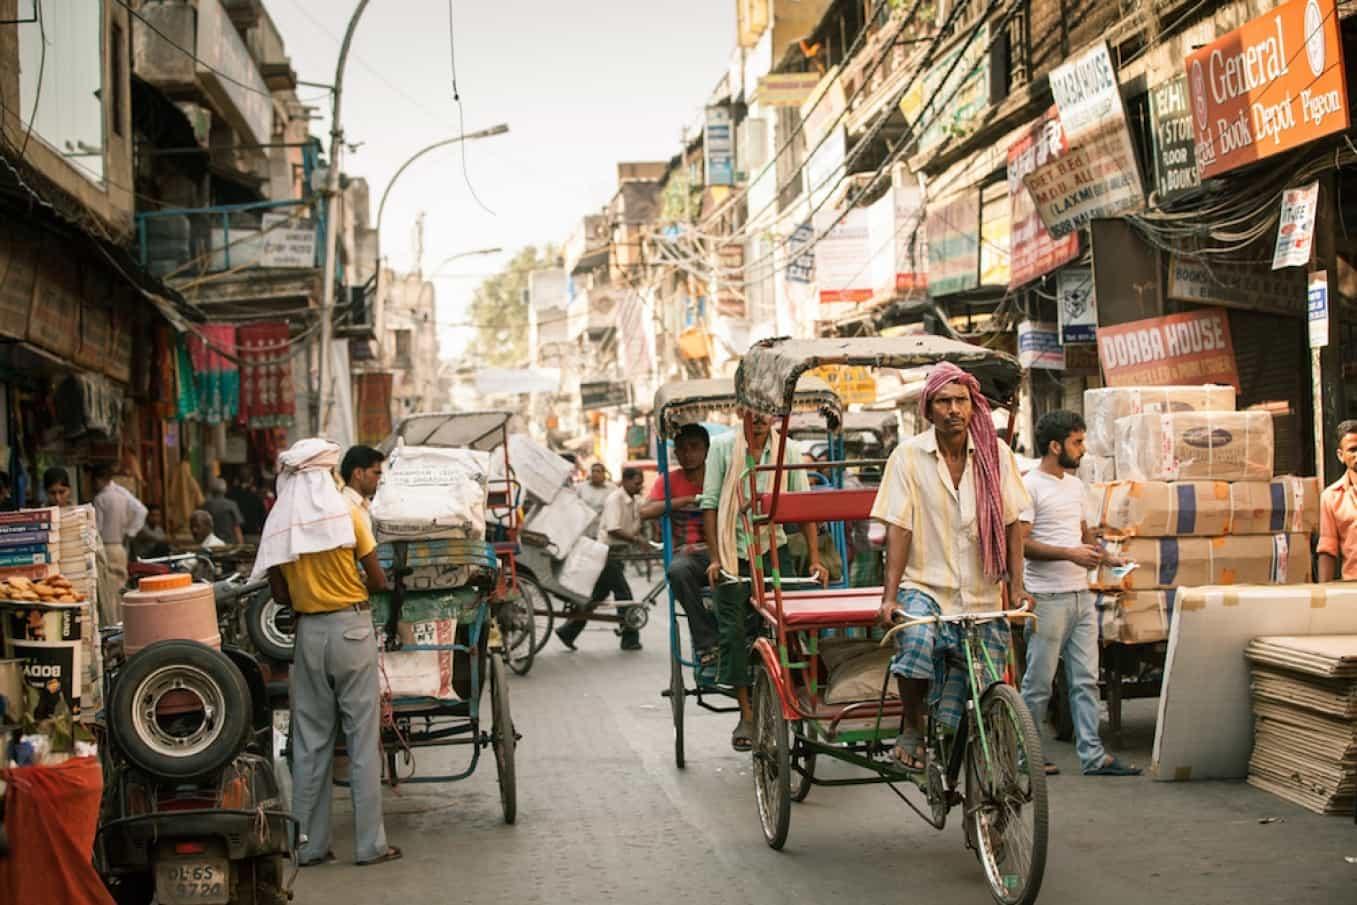 Rickshaw drivers peddling through the streets of Old Delhi. September 18, 2014. iStock.com/Elena Ermakova